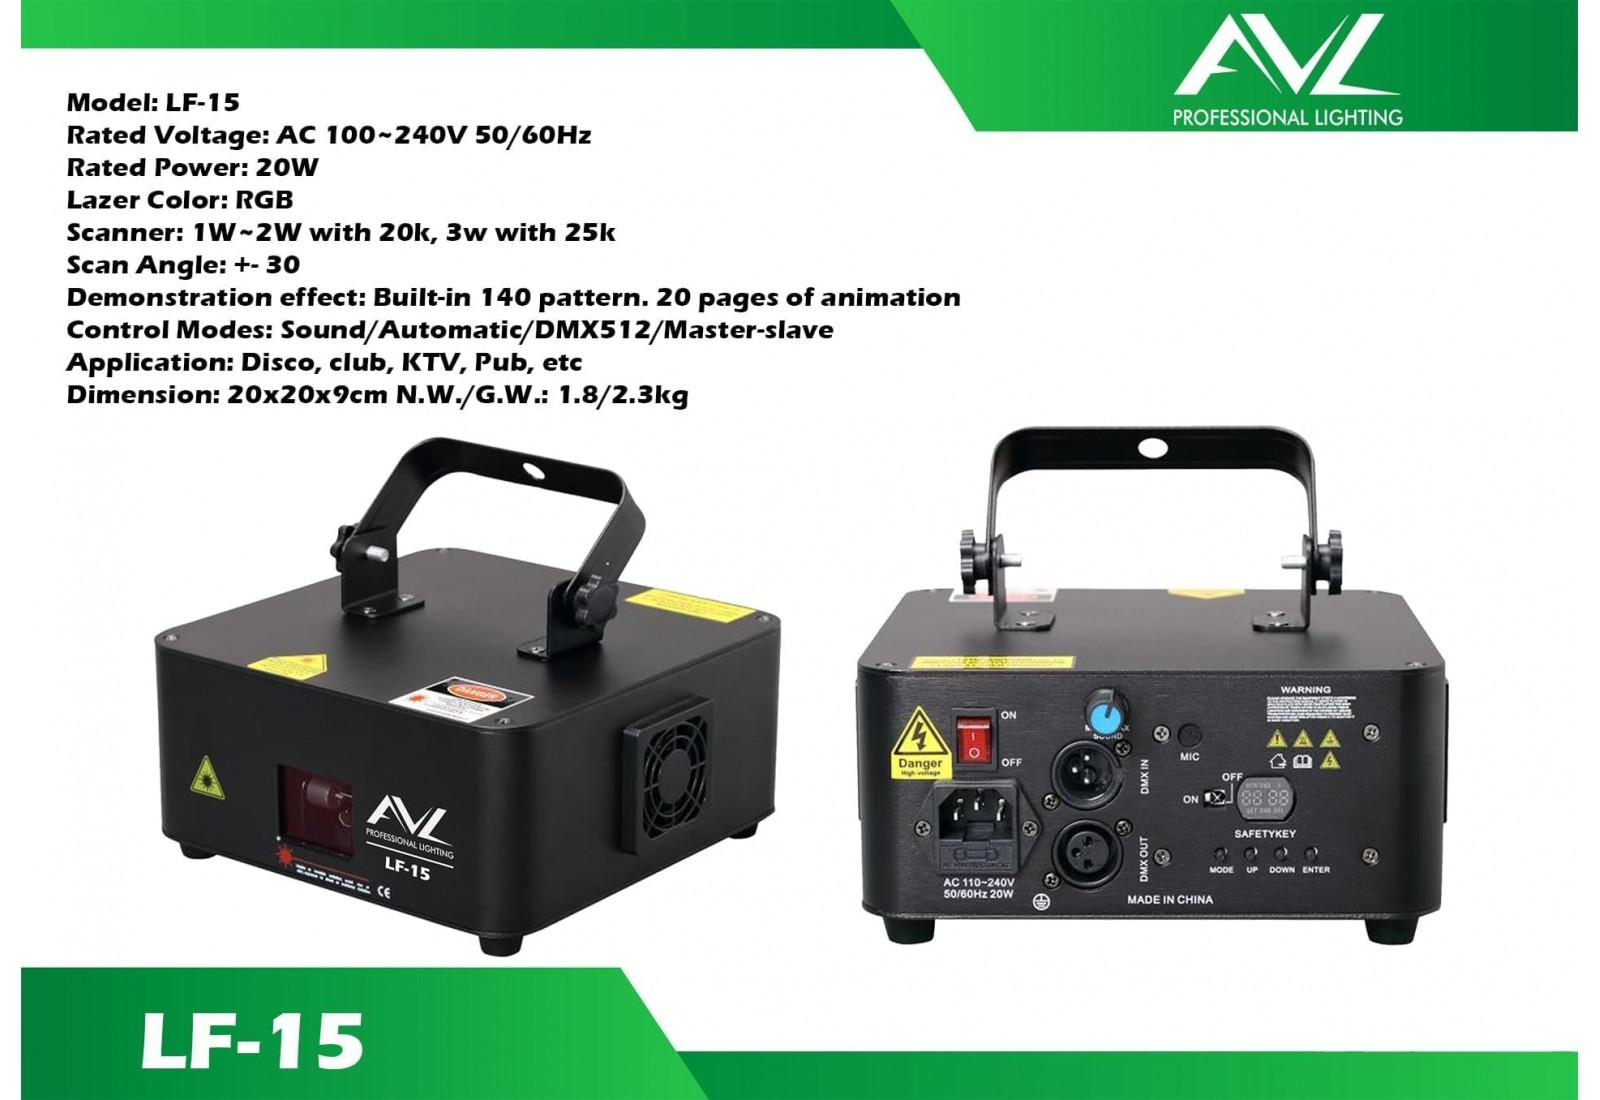 AVL LF-15